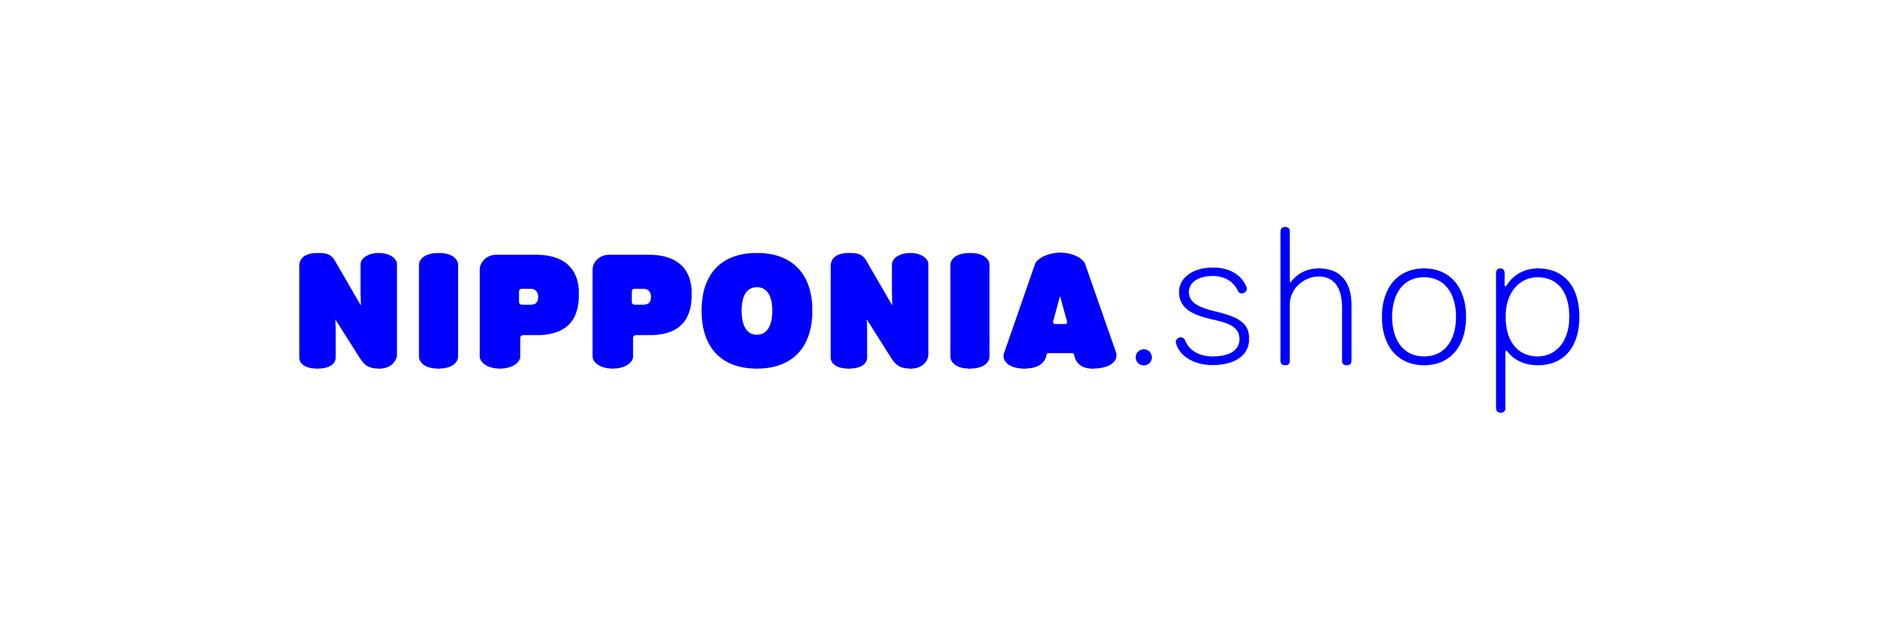 nipponia.SHOP